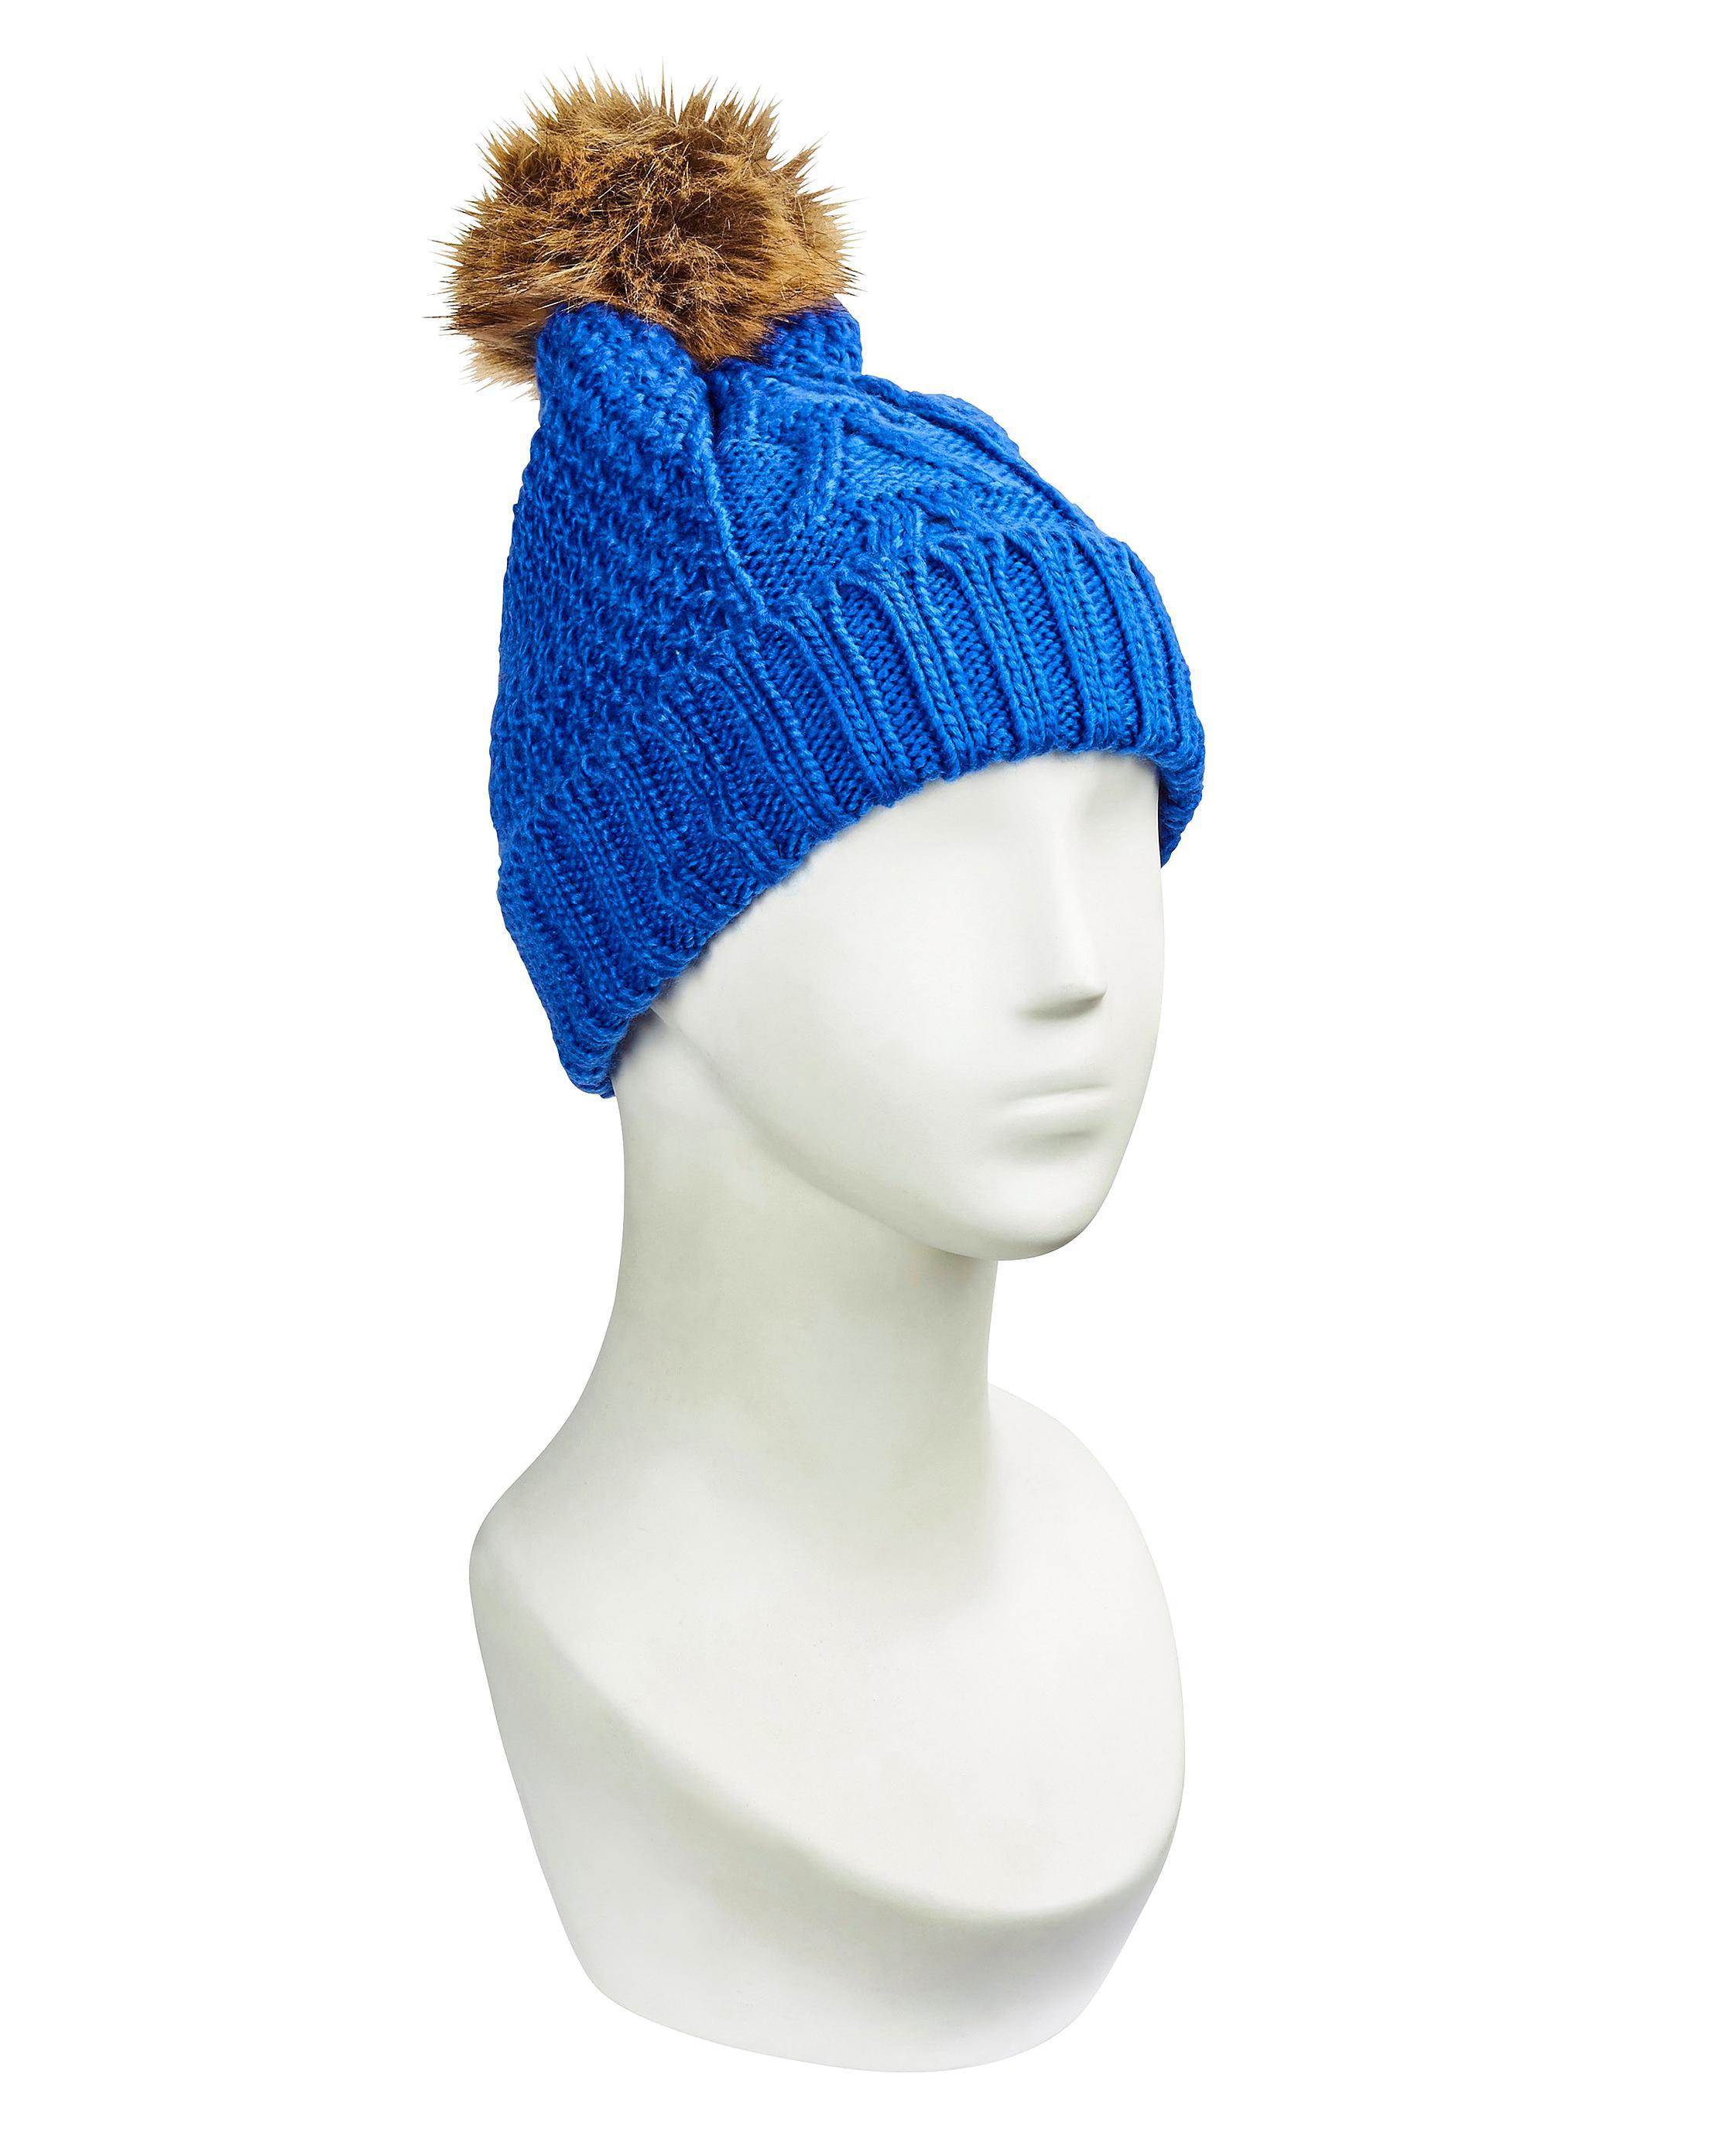 b47c3a1518c37 Lyst - Simply Be Faux Fur Pom Pom Hat in Blue